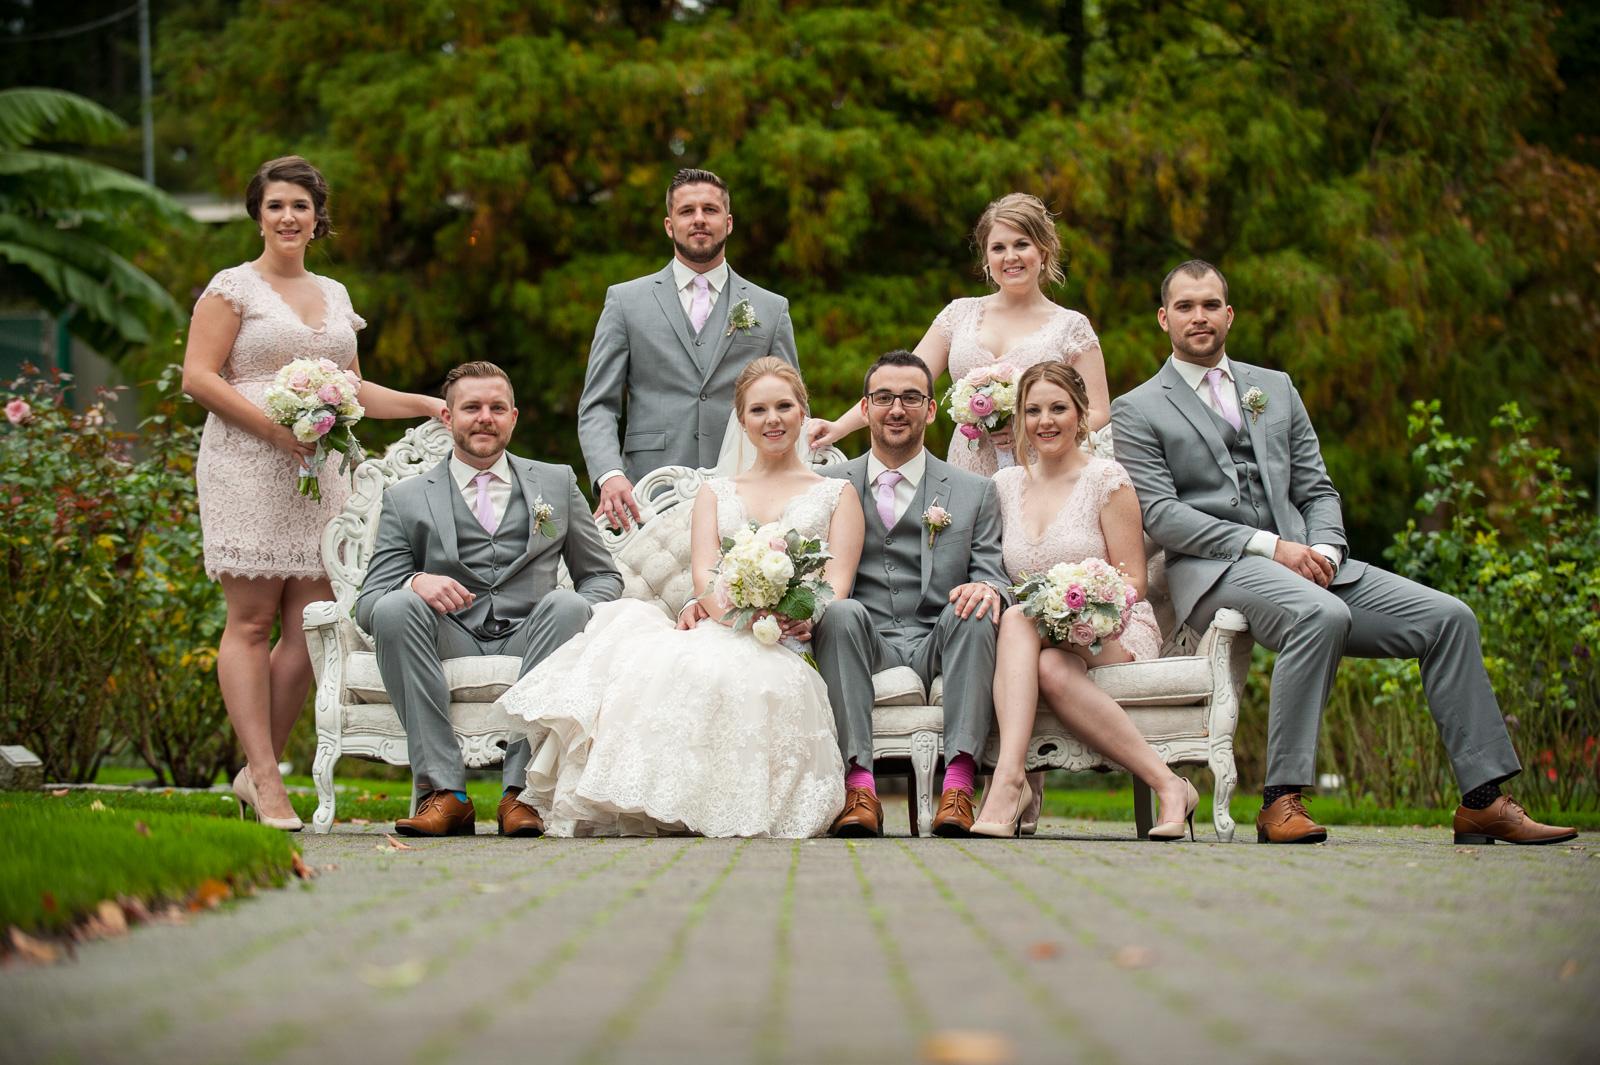 victoria-wedding-photographers-milner-chapel-wedding-centennial-lodge-wedding-19.jpg